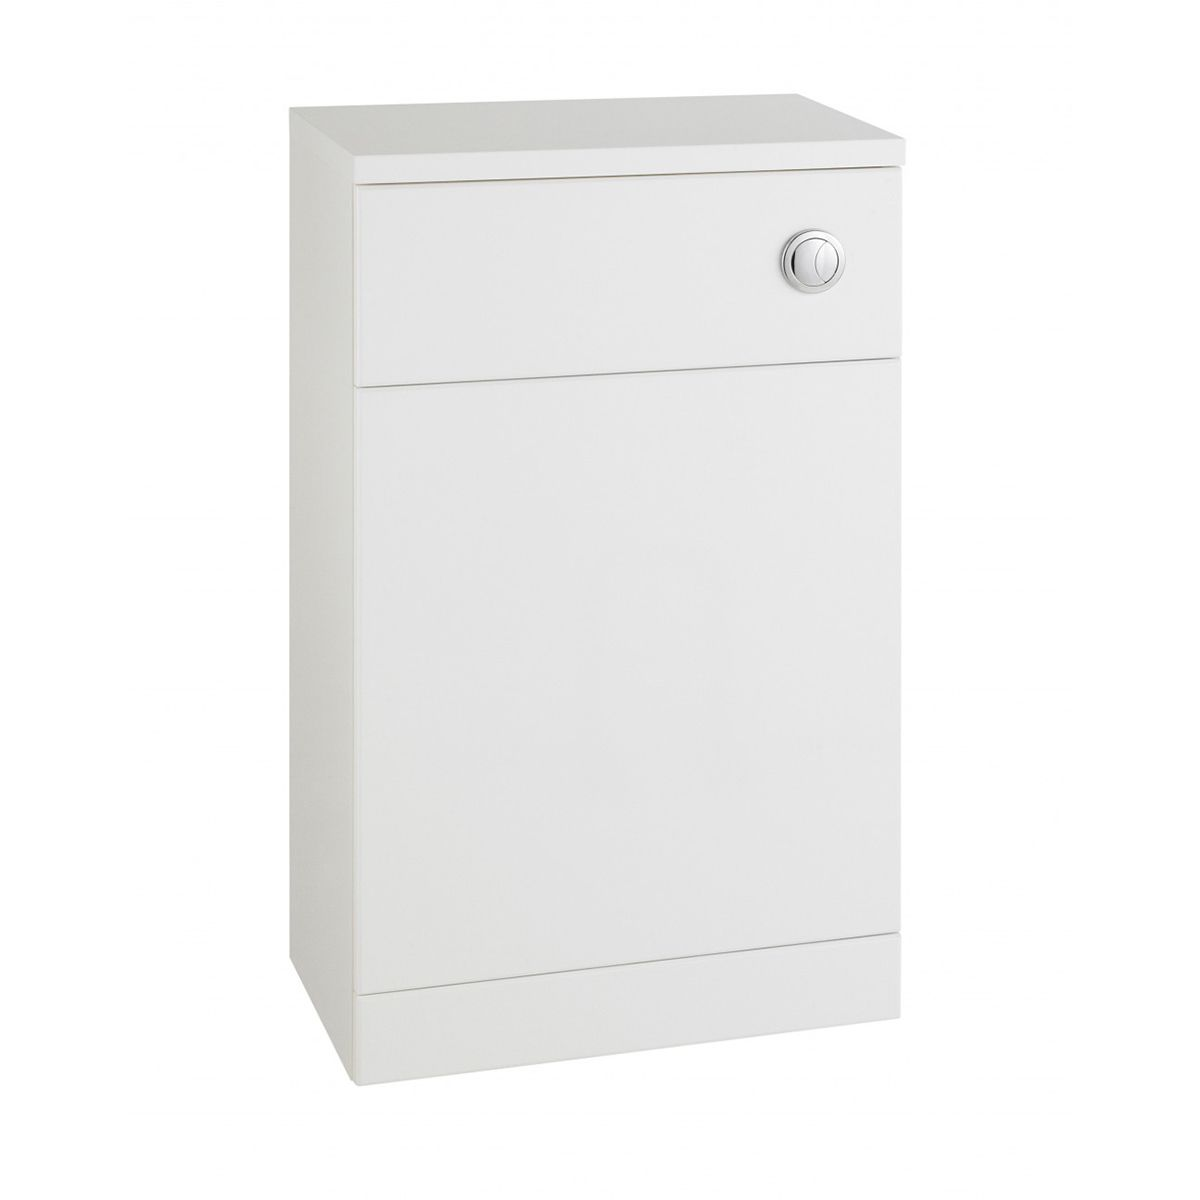 Kartell Encore White Wall WC Toilet Unit 500mm